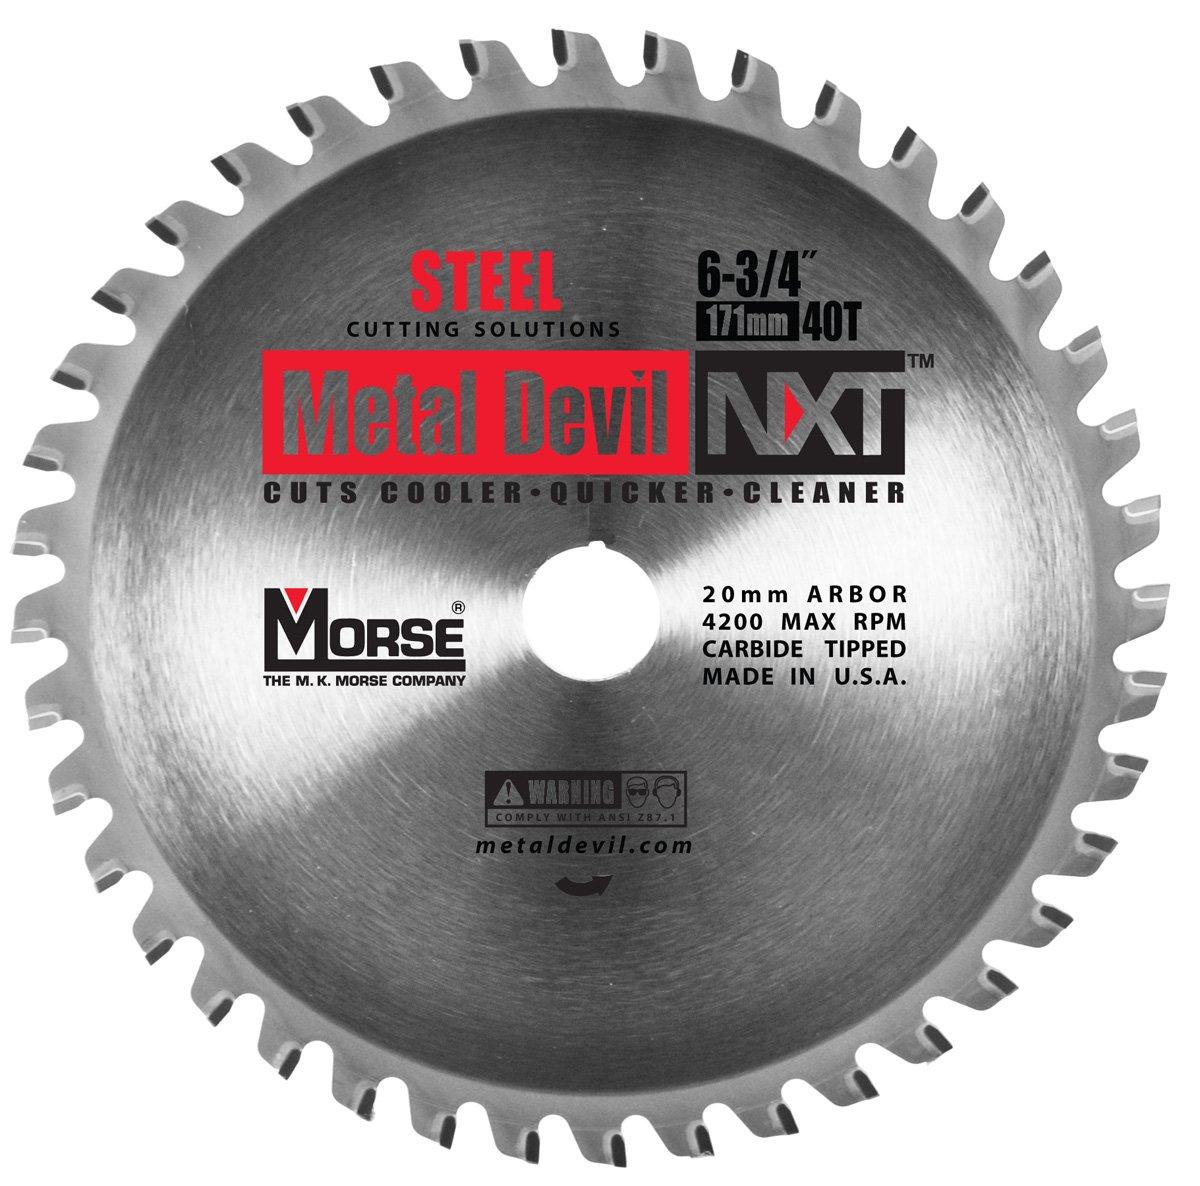 Disco Sierra MK MORSE CSM67540NSC Metal Devil NXT 6 3 / 4i